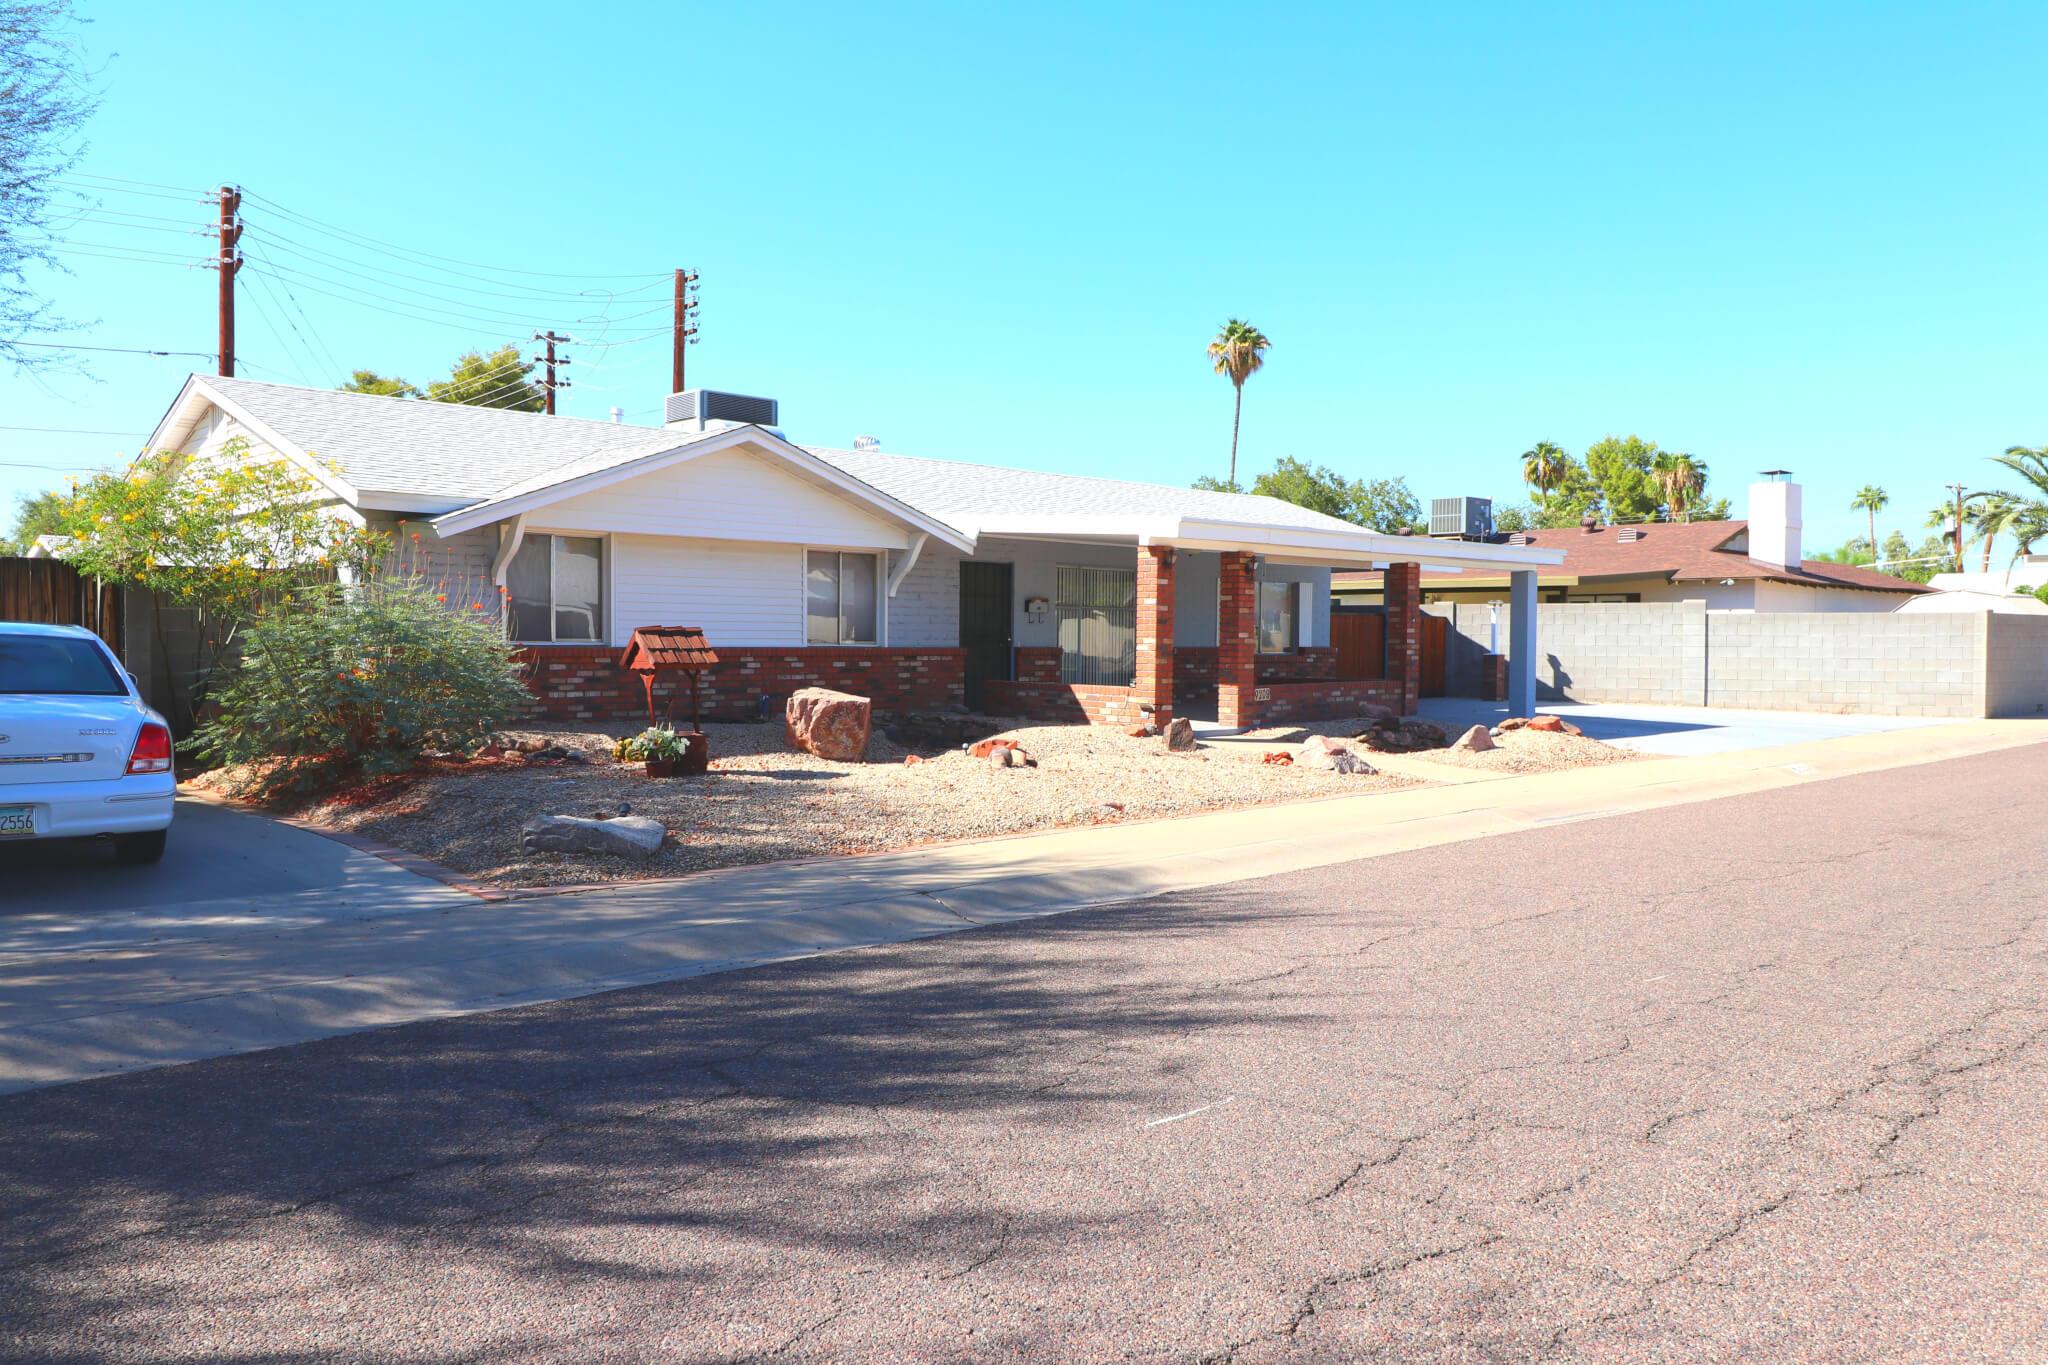 9208 N 18th Avenue, Phoenix, AZ, 85021